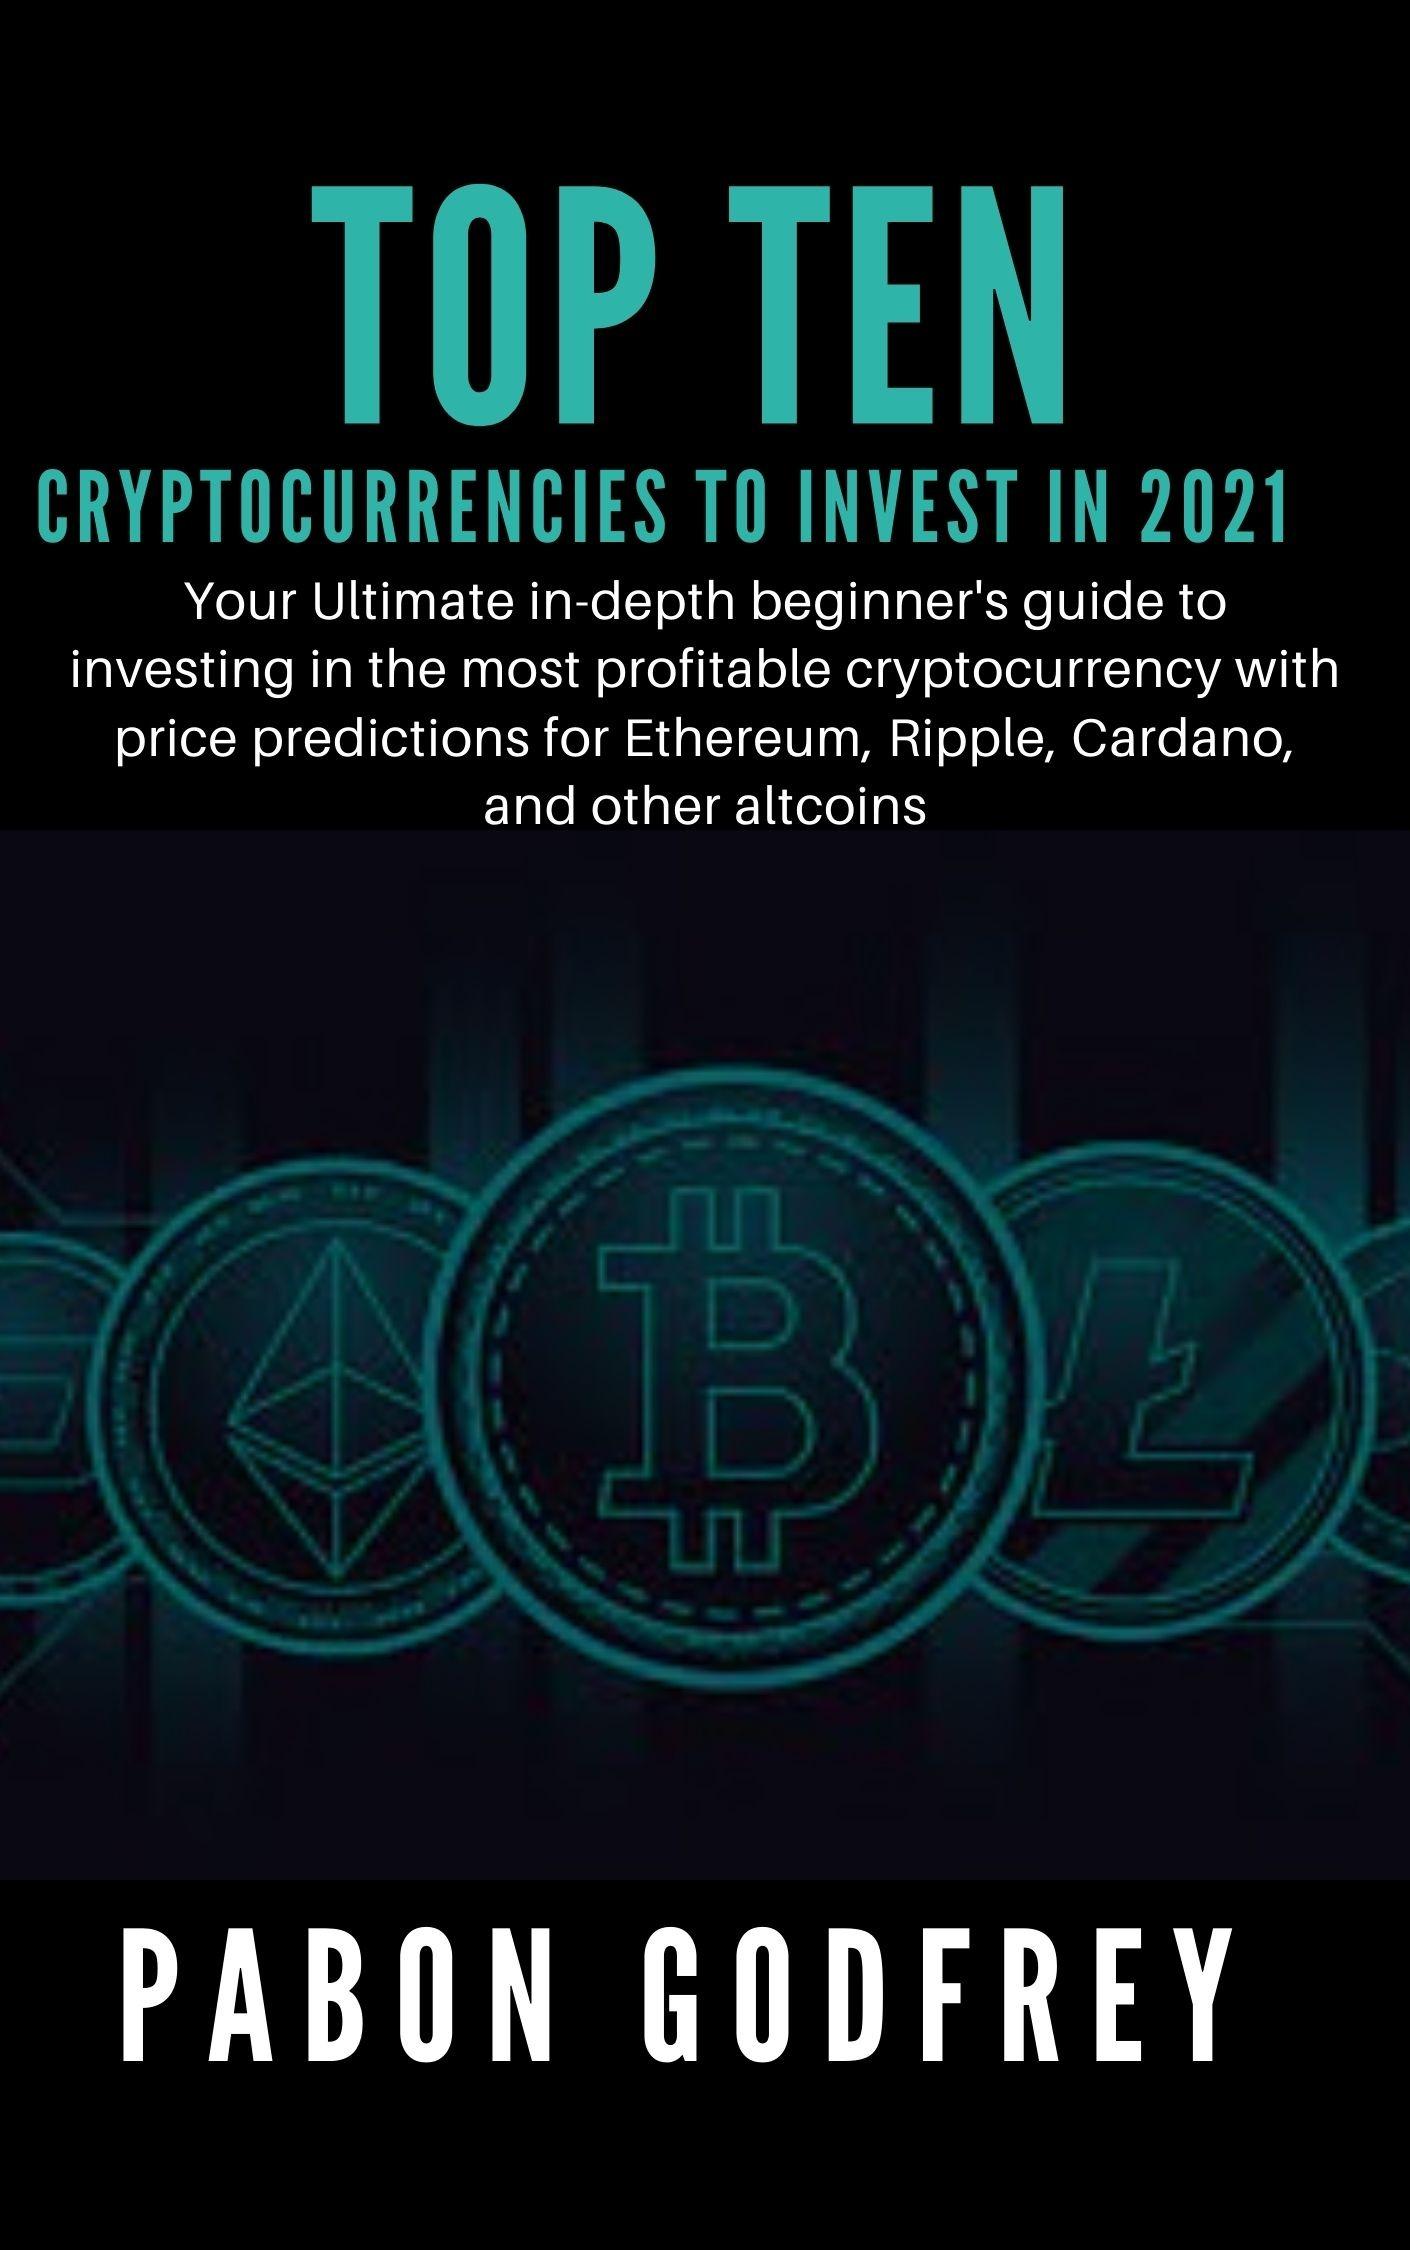 TOP TEN CRYPTOCURRENCIES TO INVEST IN 2021